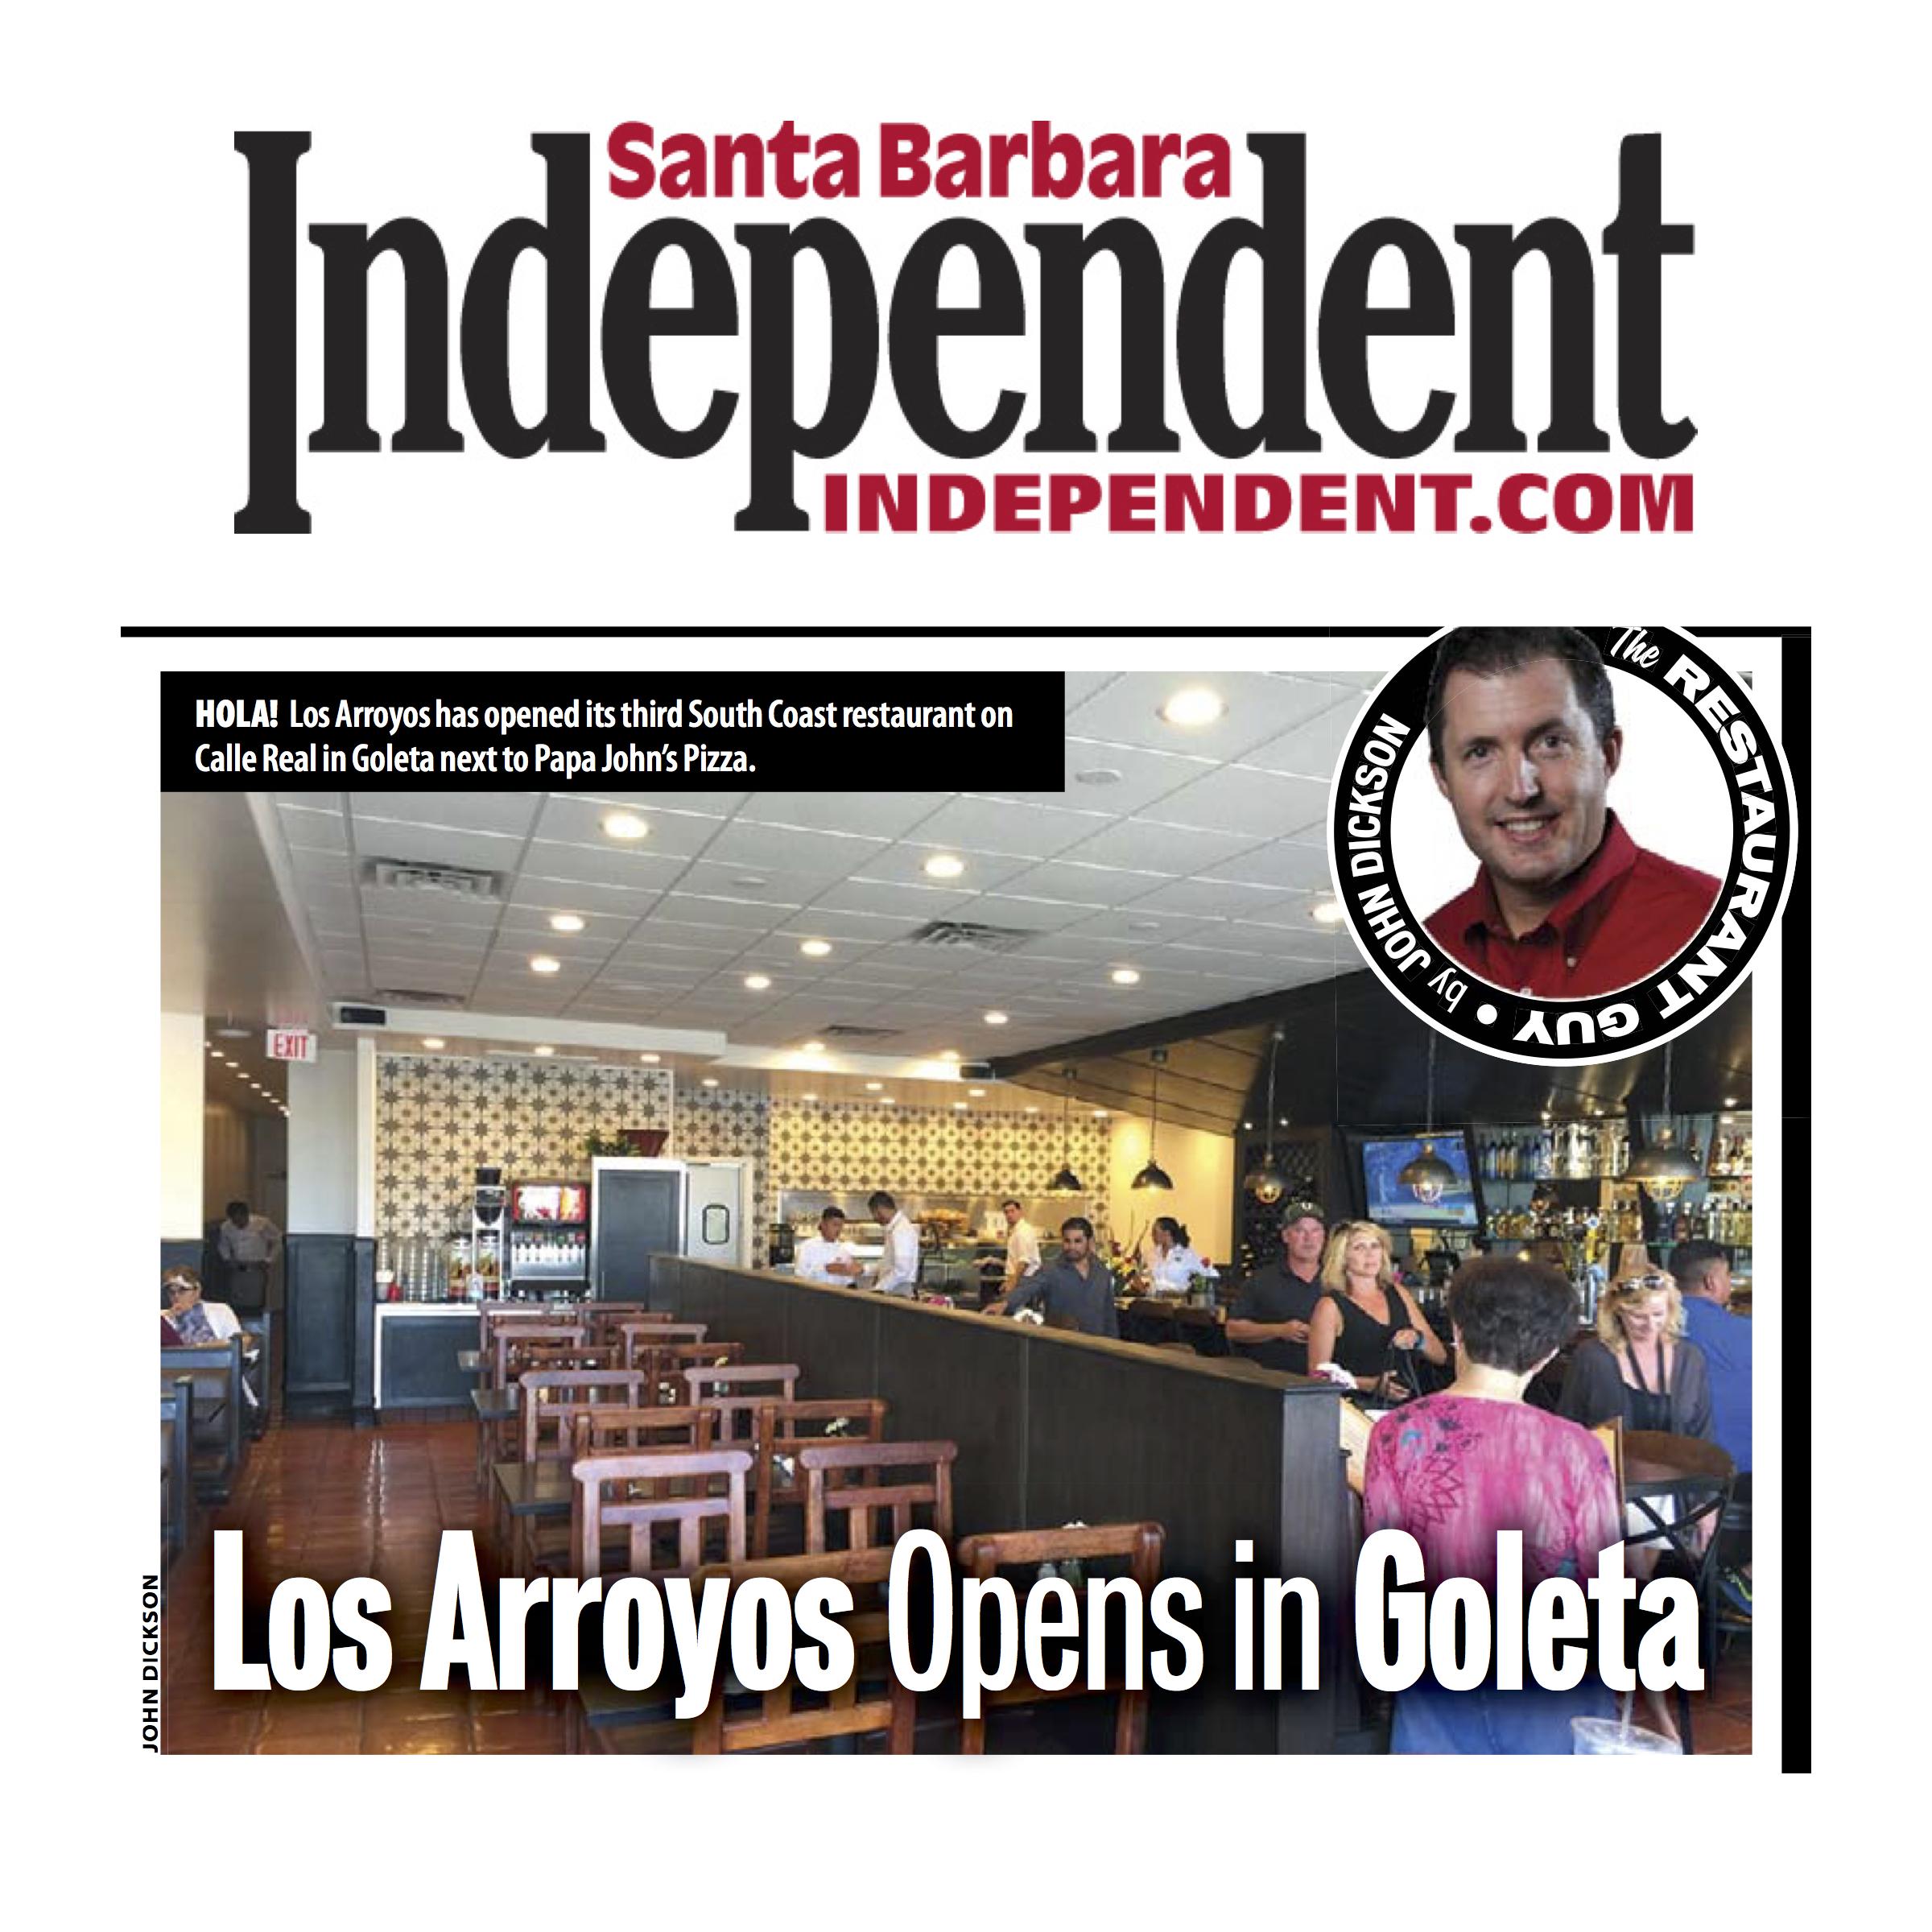 LosArroyos_Website_InTheNews_Independent.jpg